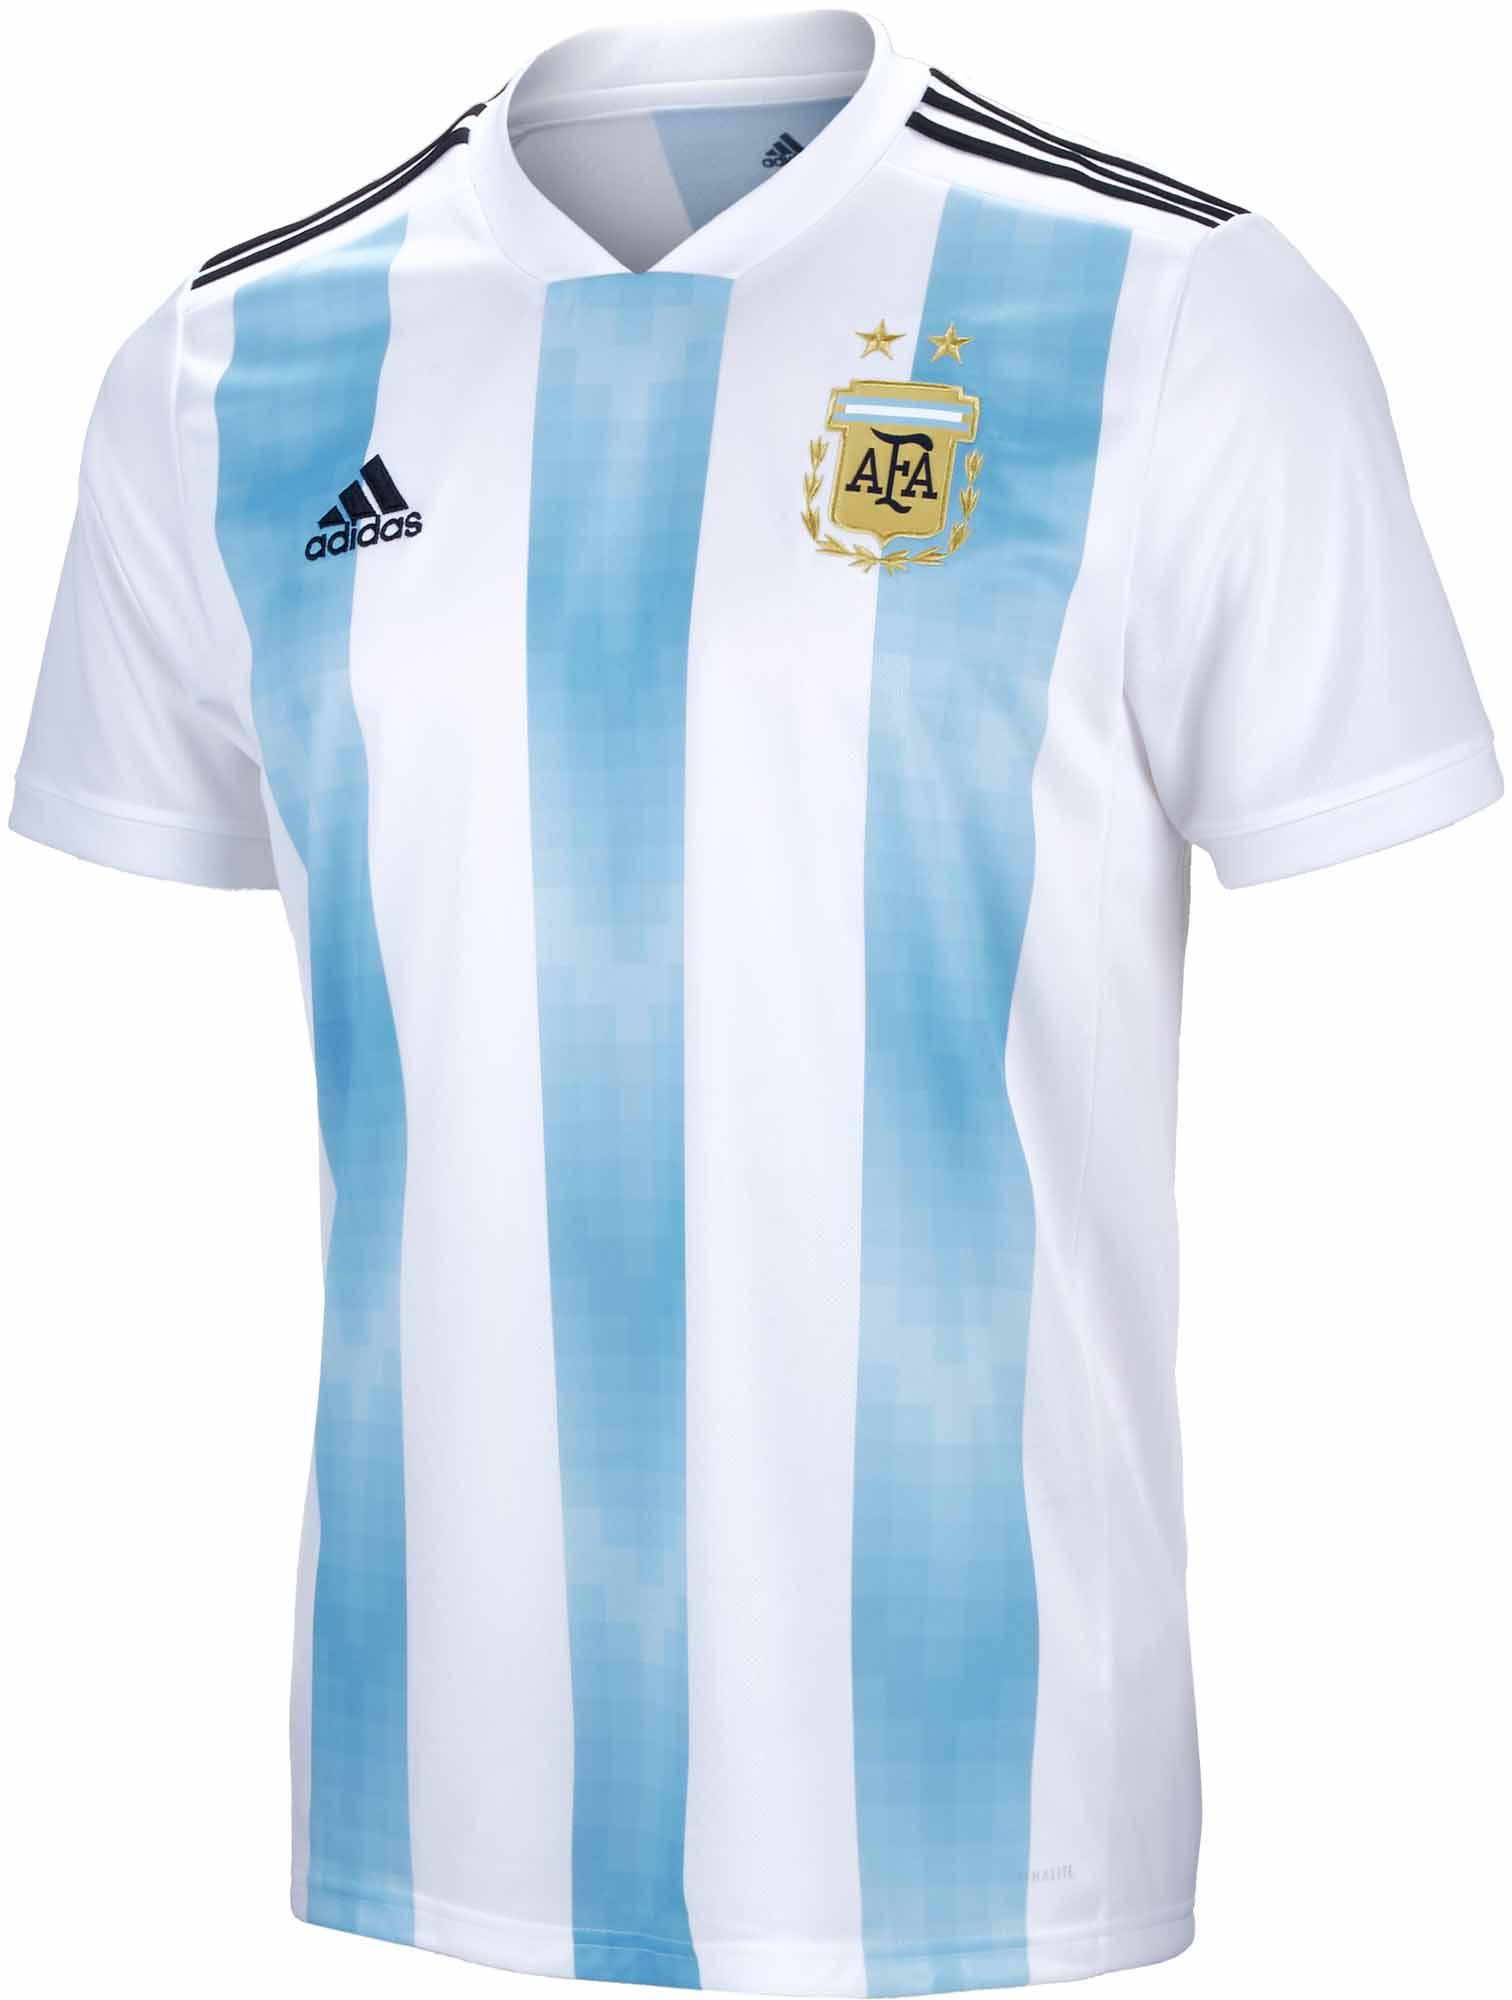 adidas Argentina Home Jersey 2018-19 - SoccerPro.com